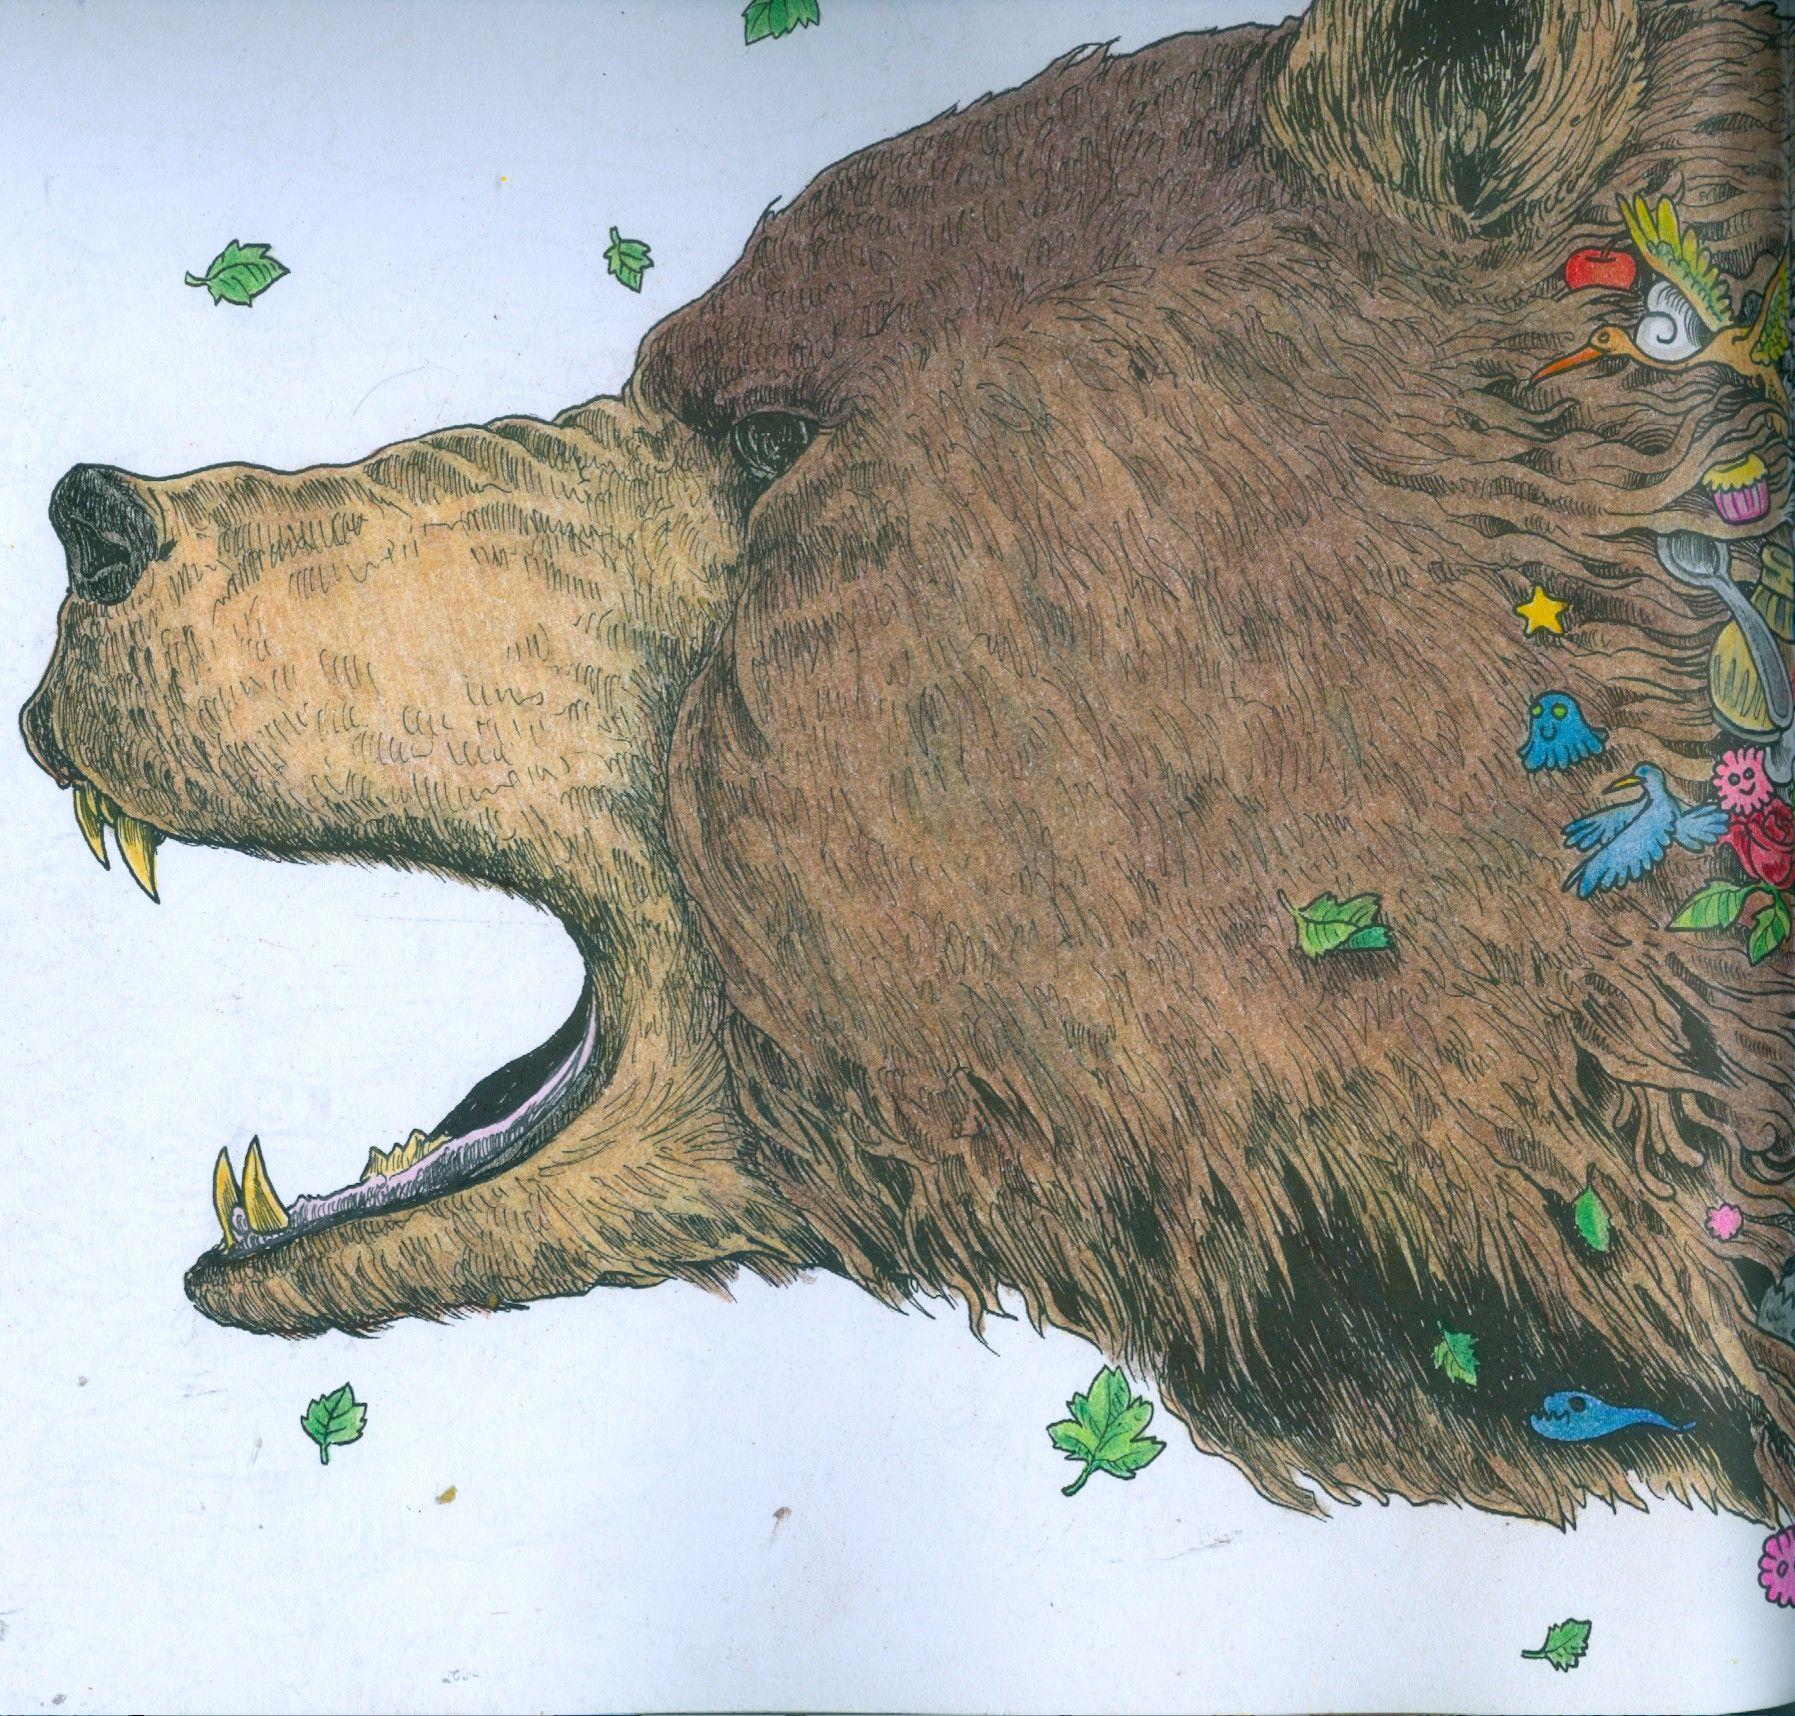 Bear 2 of 2